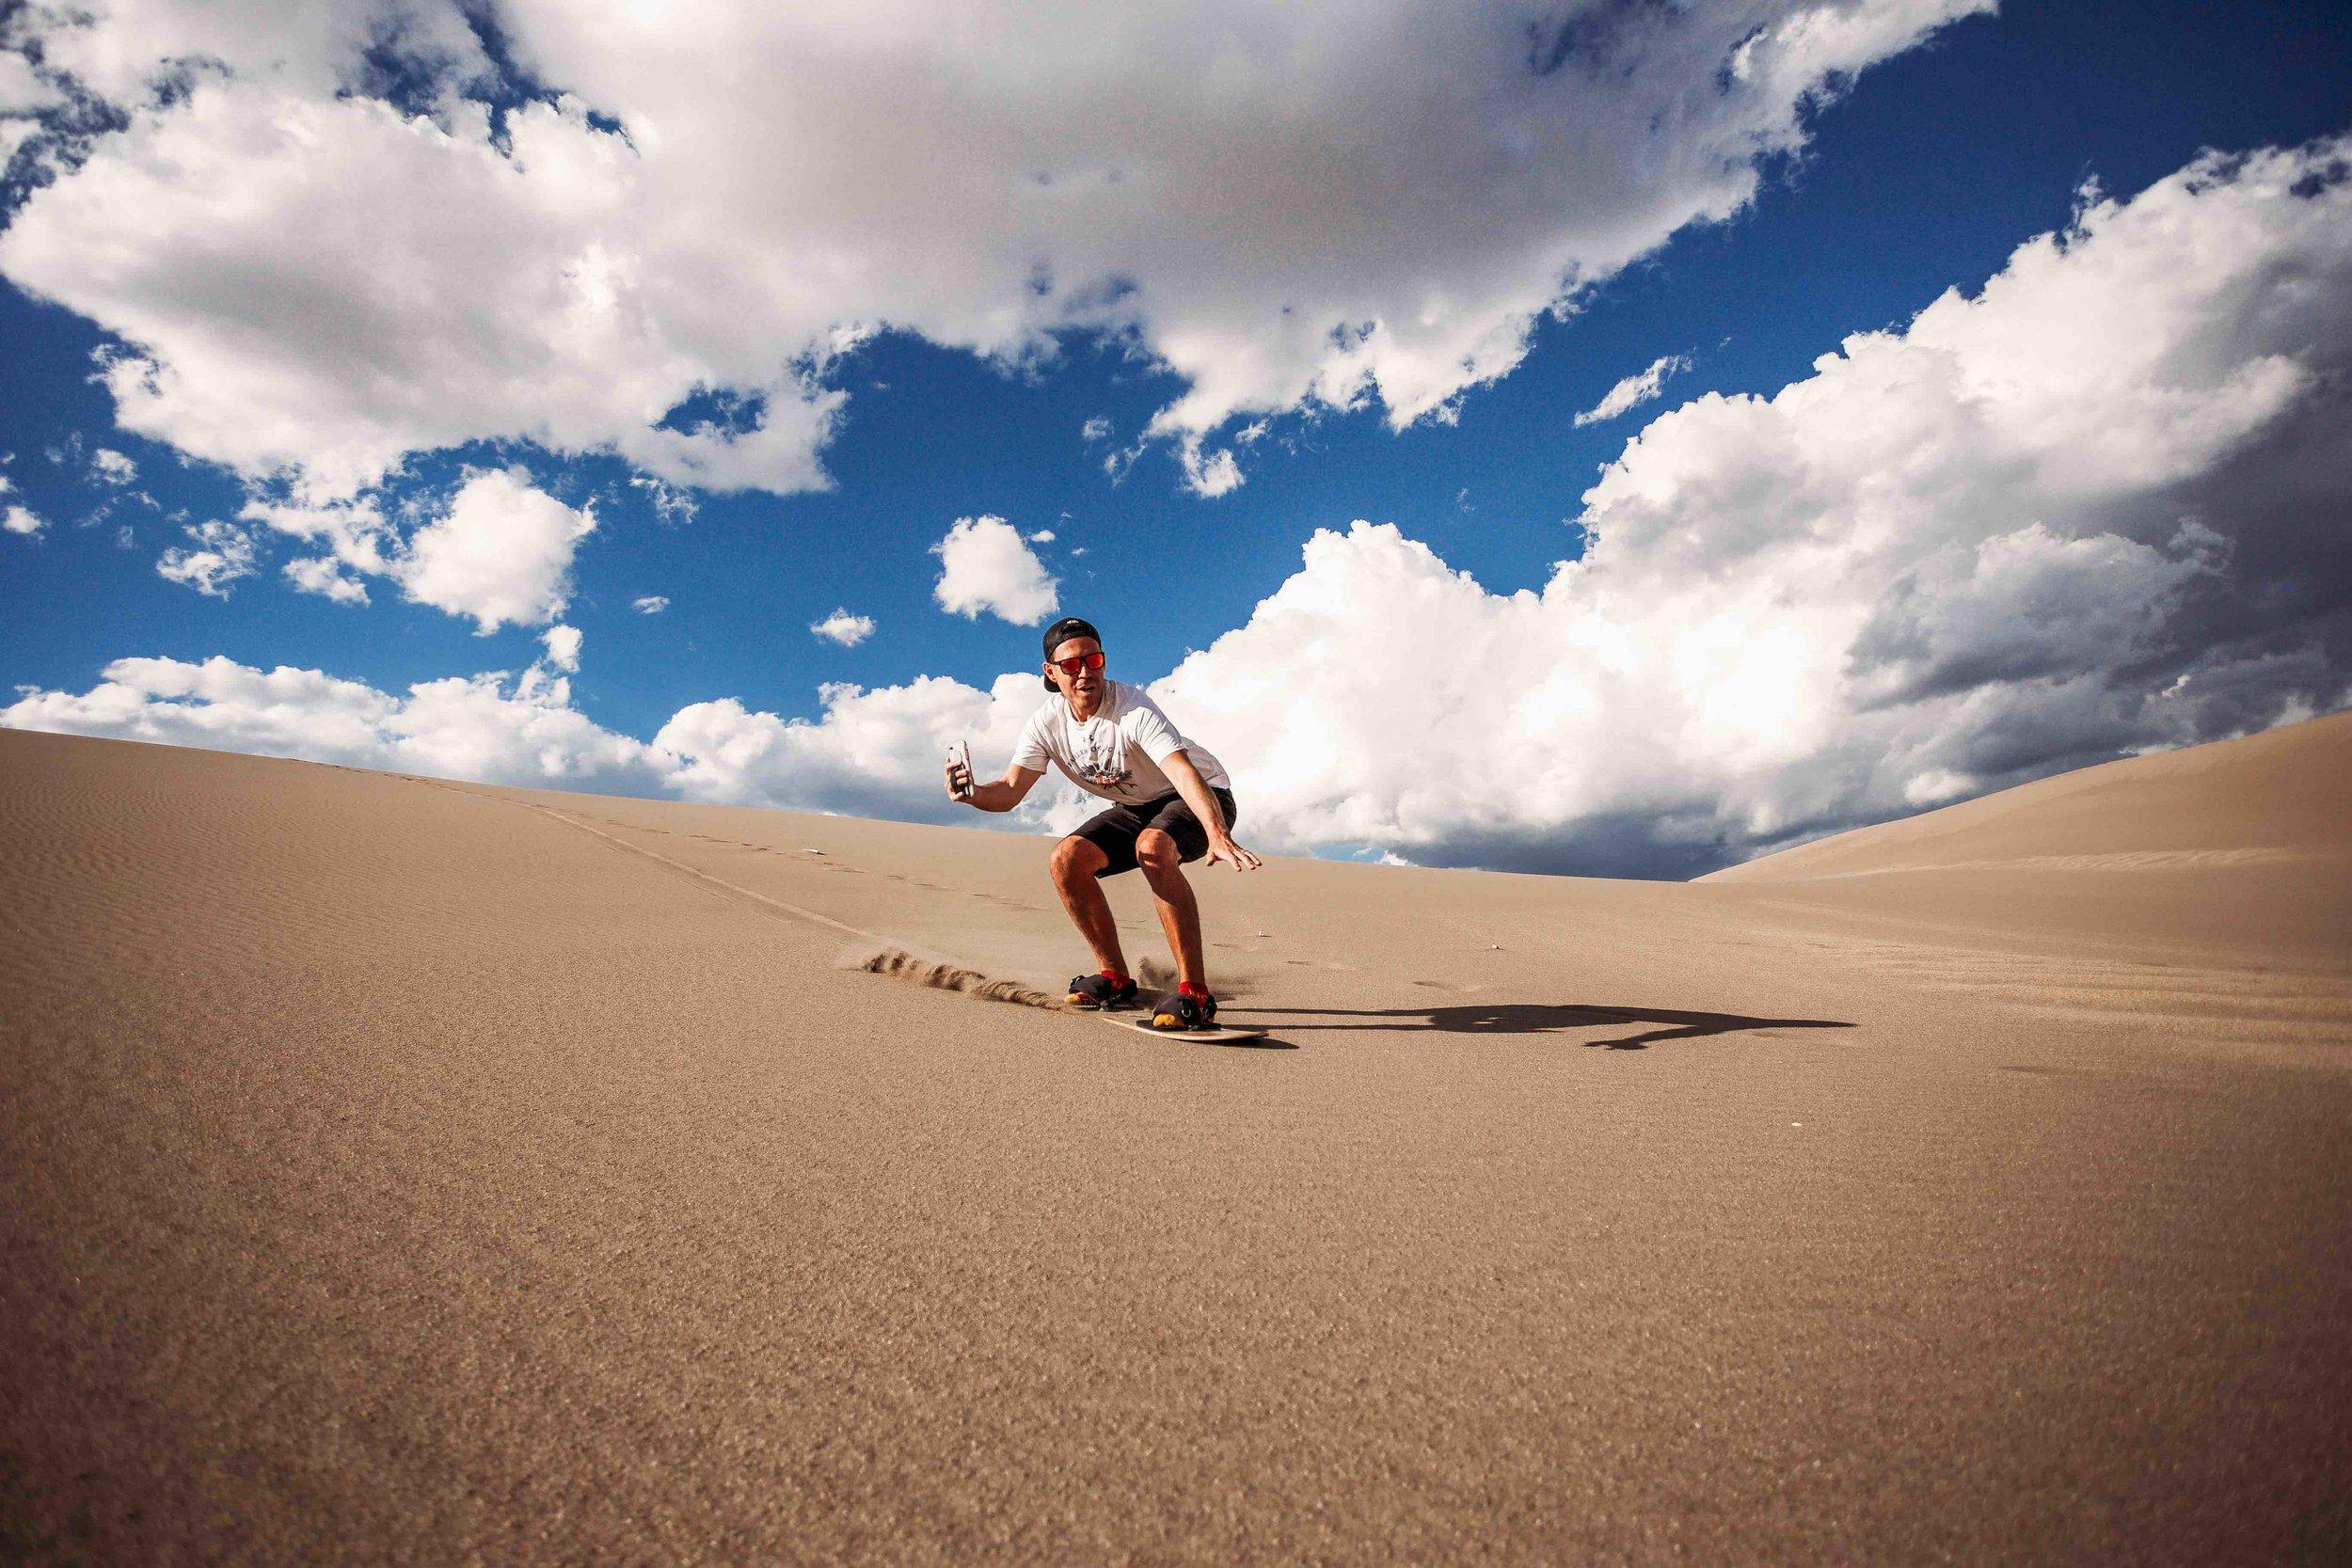 Boondocking near Great Sand Dunes National Park00013.jpeg